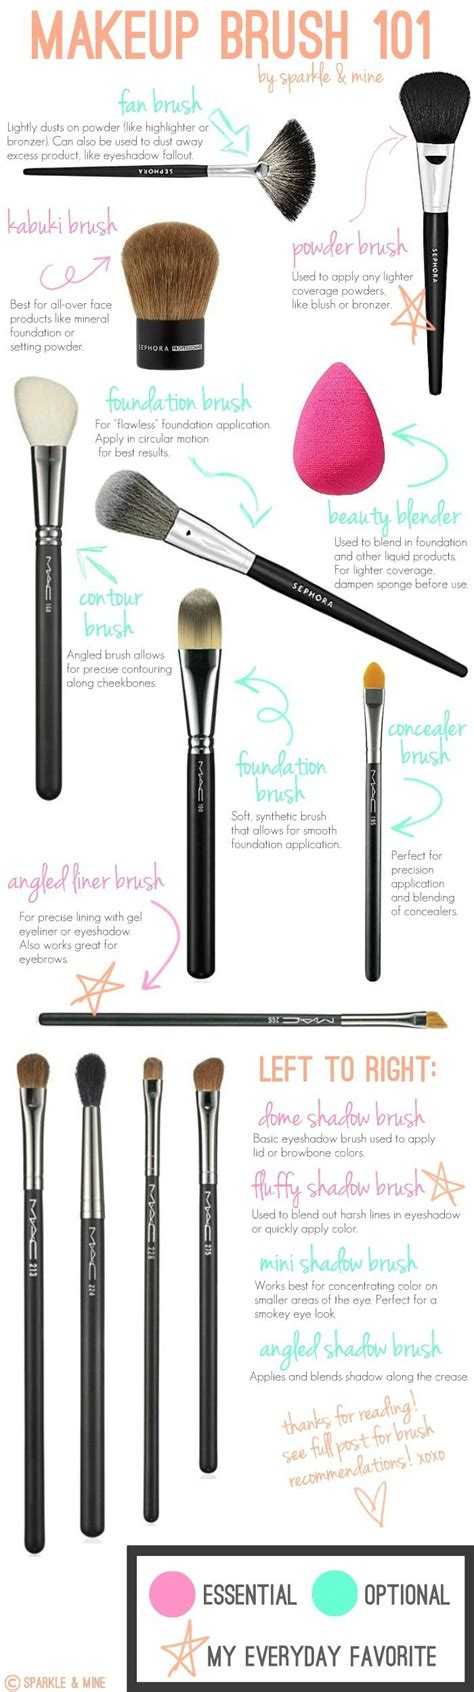 Makeup Brush 101 Hair And Skin Care Pinterest